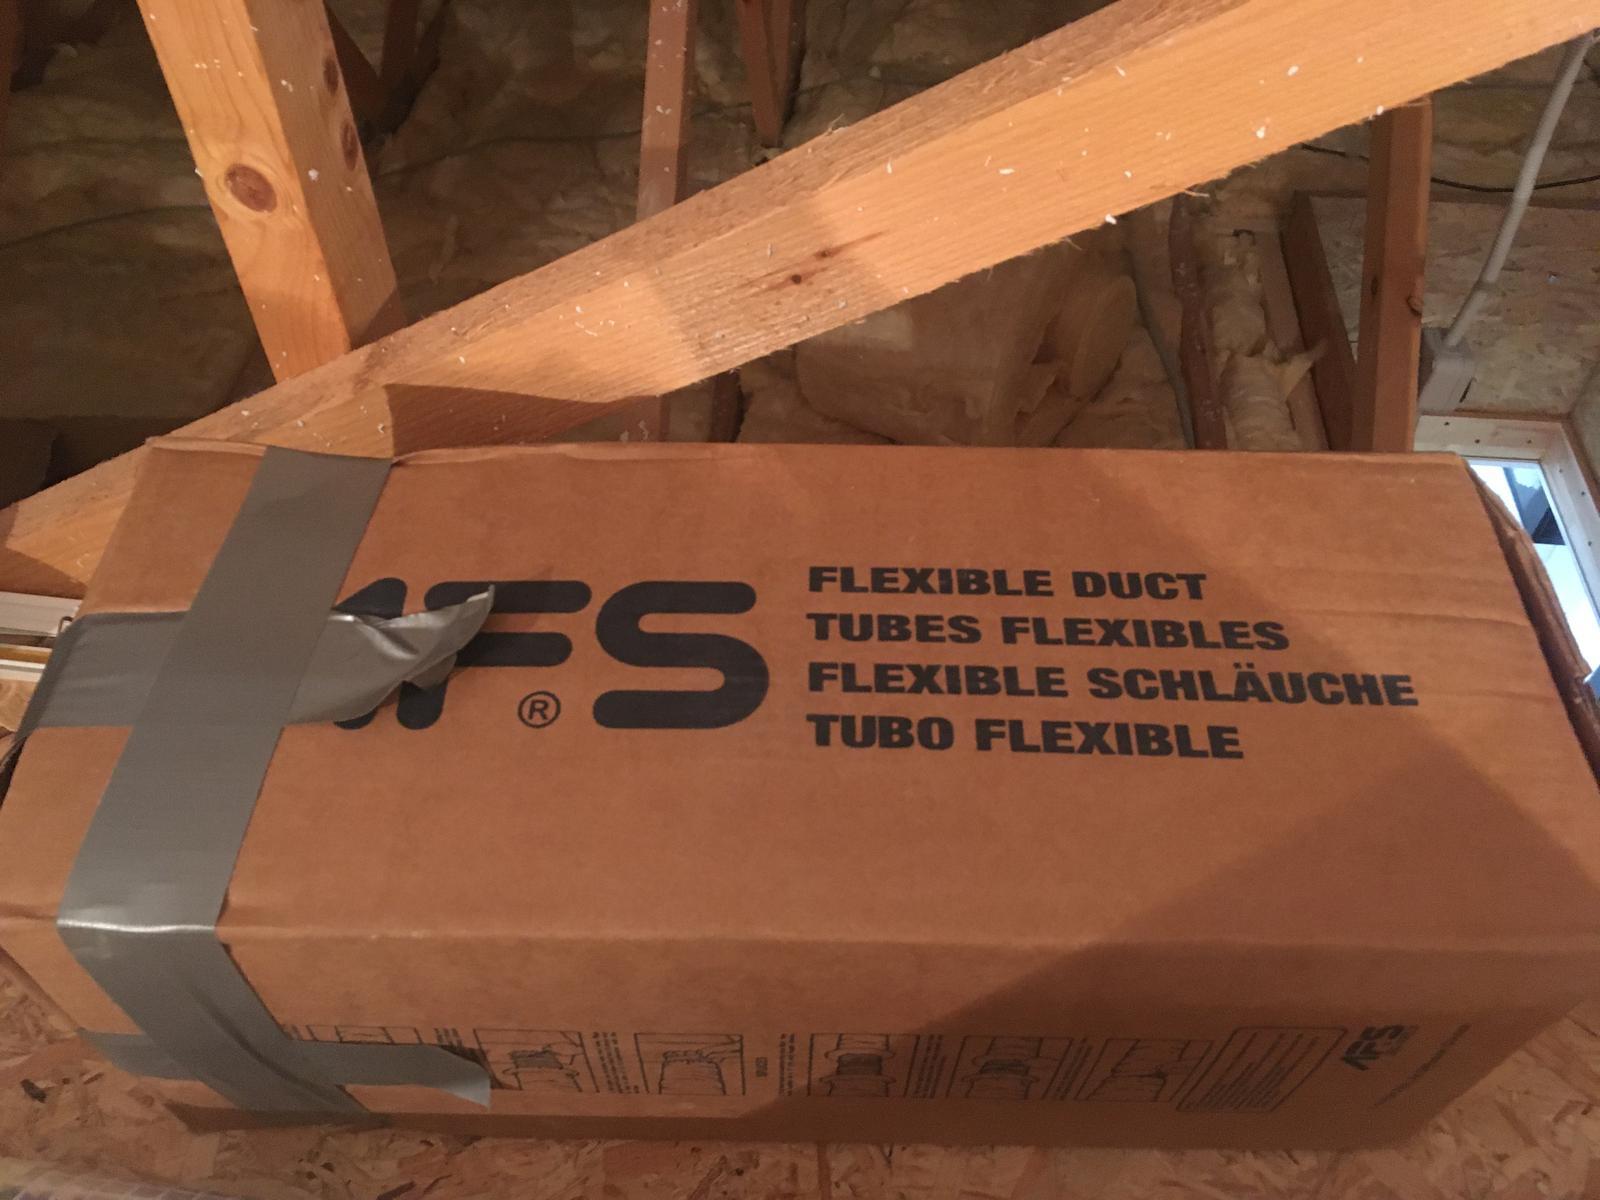 Flexibilný tlmič hluku 125x1000mm - Obrázok č. 1